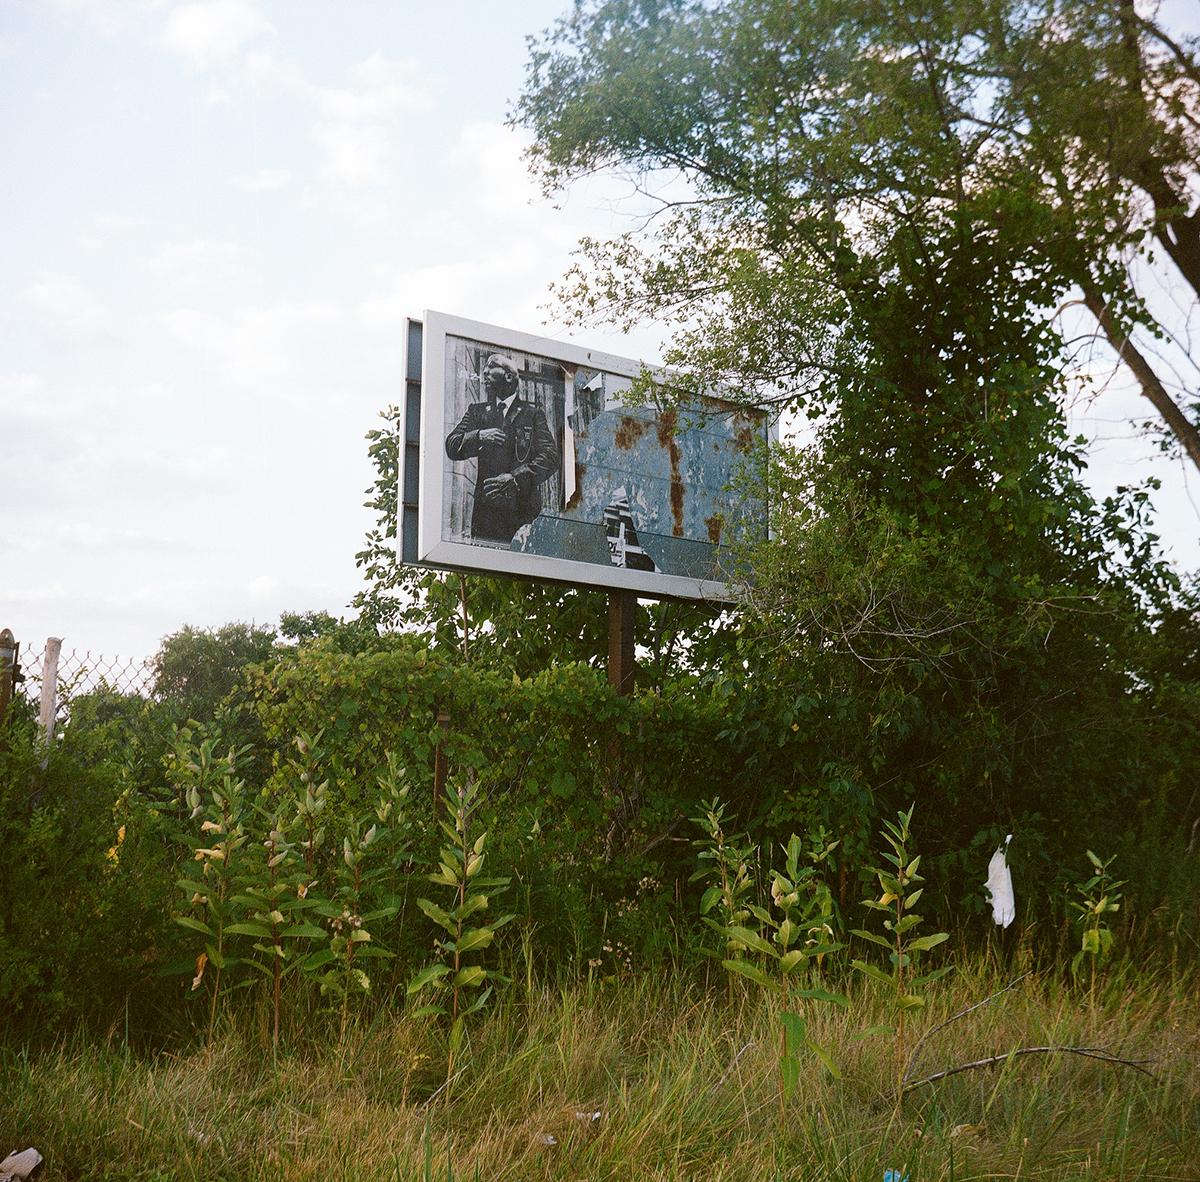 Gateway_Billboards-89.jpg